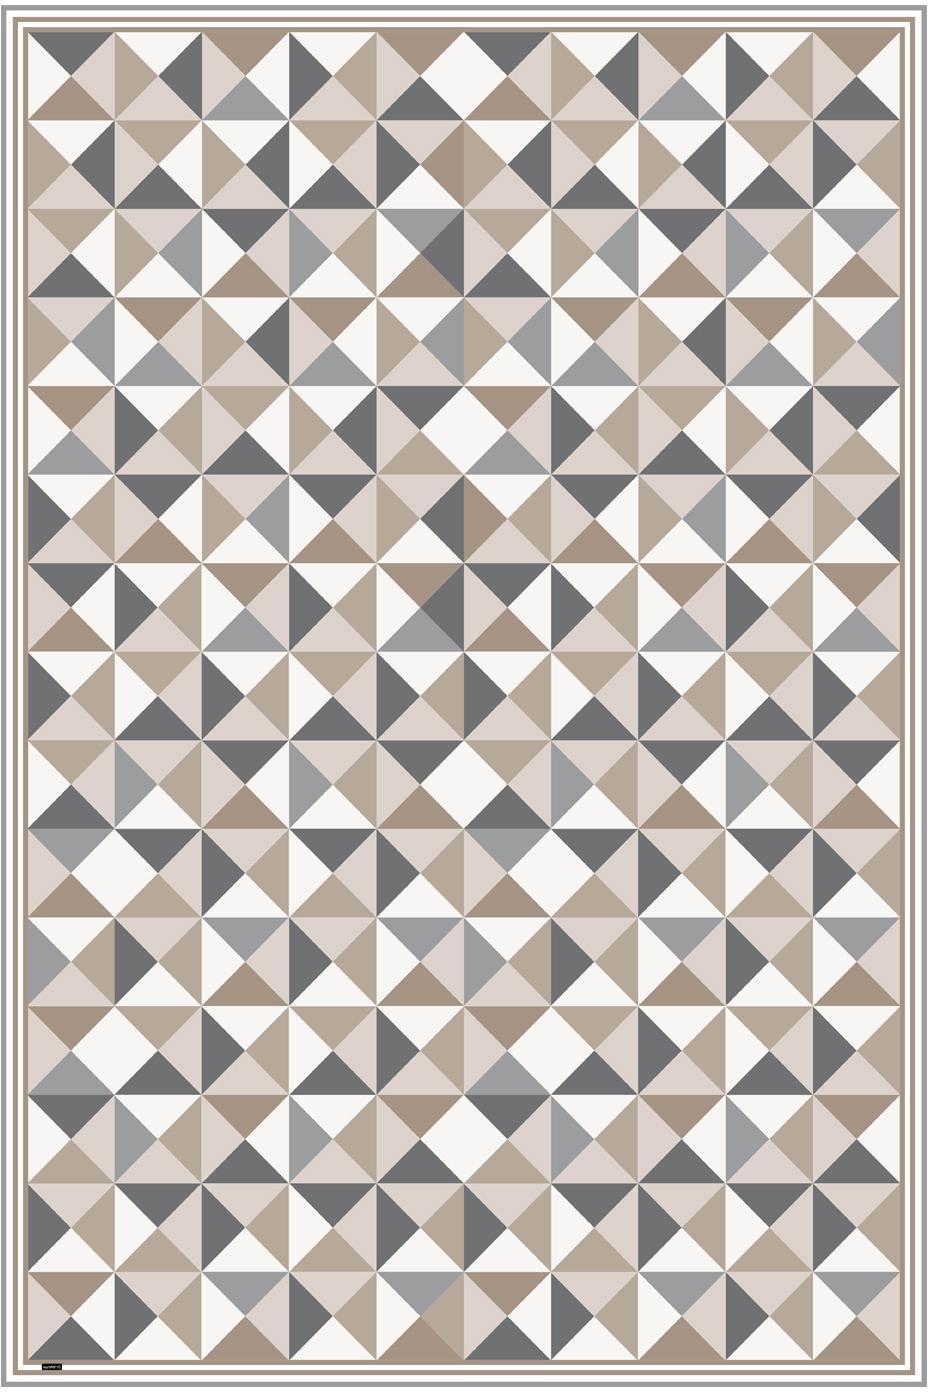 Tappetino in vinile Haakon, Vinile, riciclabile, Grigio, beige, bianco, Larg. 136 x Lung. 203 cm